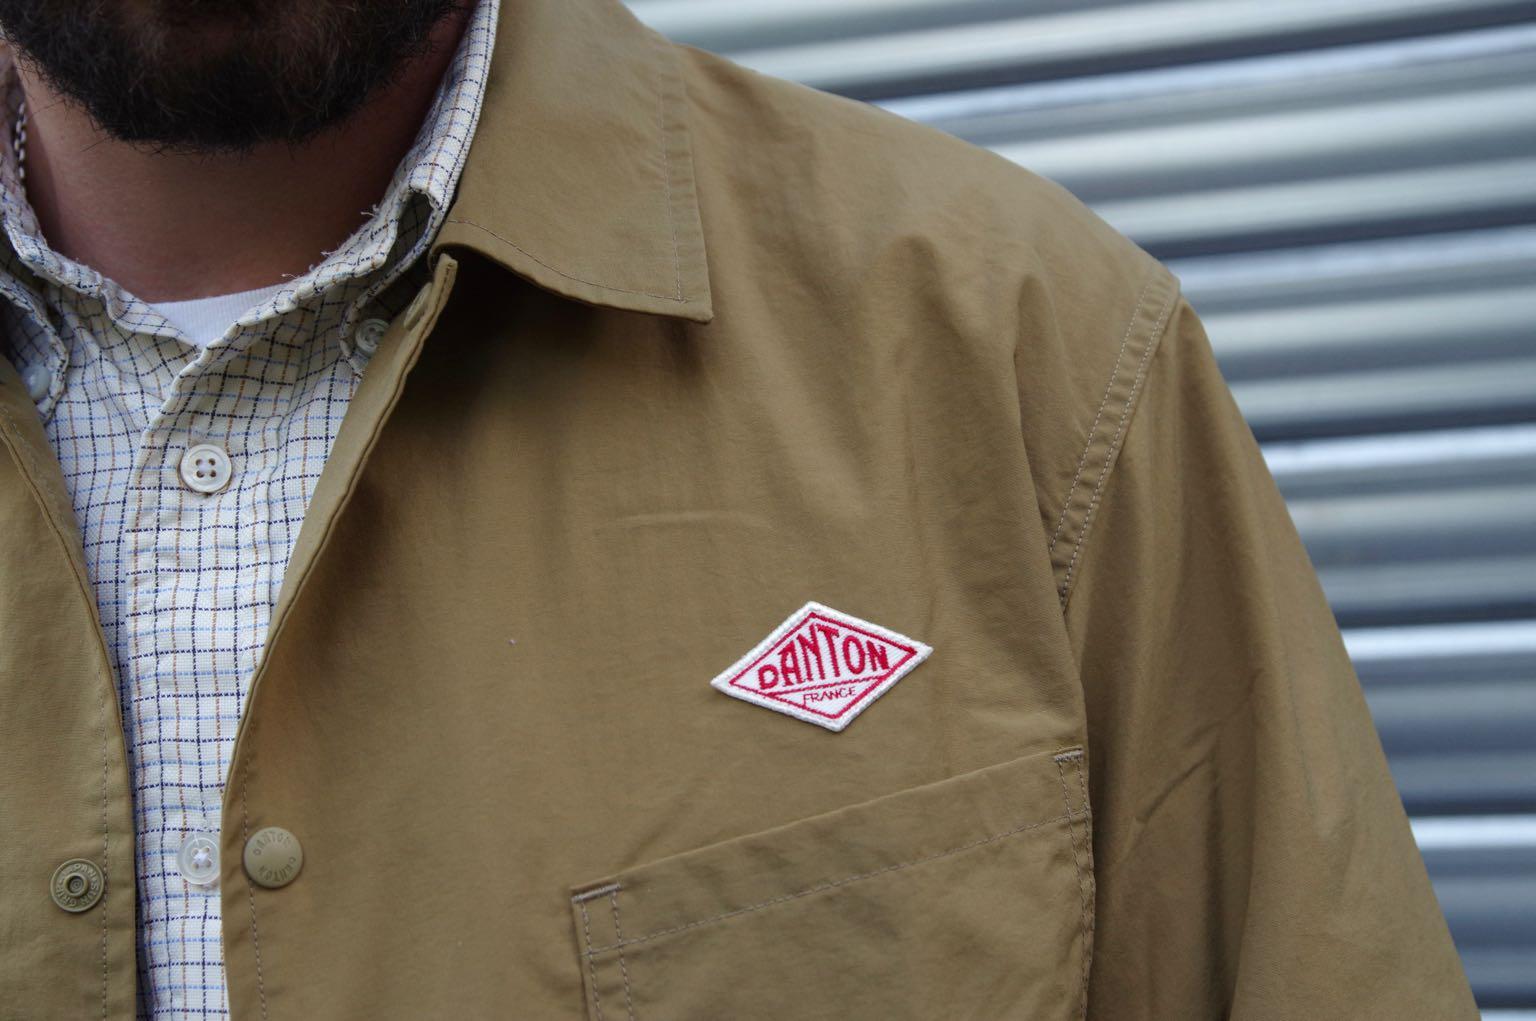 Veste Danton nylon taffeta jacket - une veste de travail et coach jacket